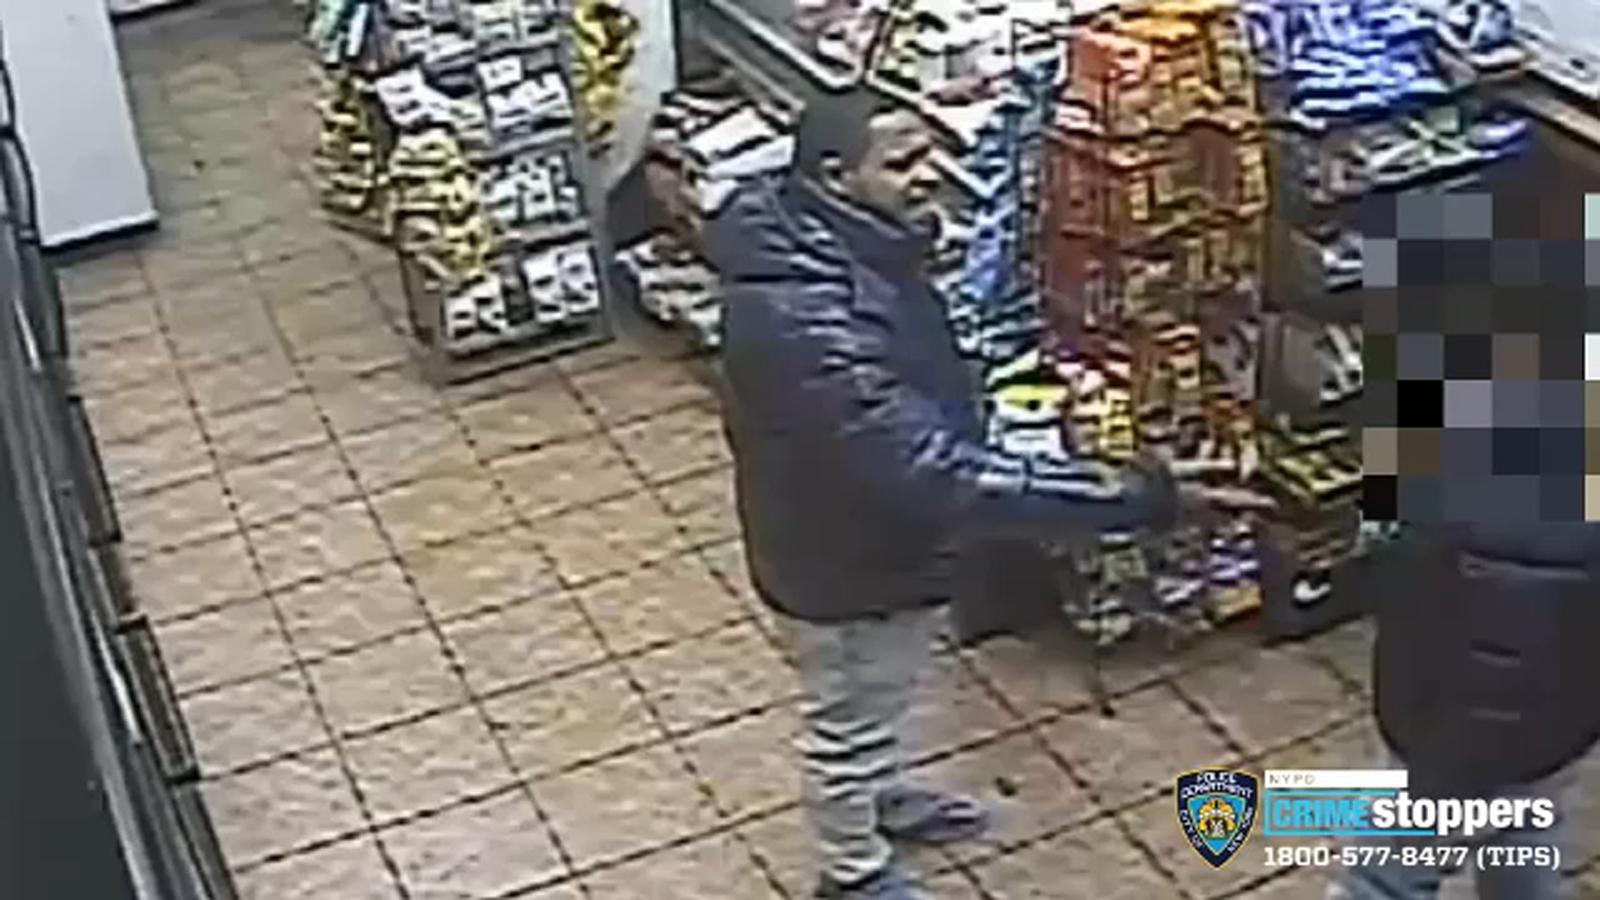 Man stabbed multiple times in Manhattan deli during argument